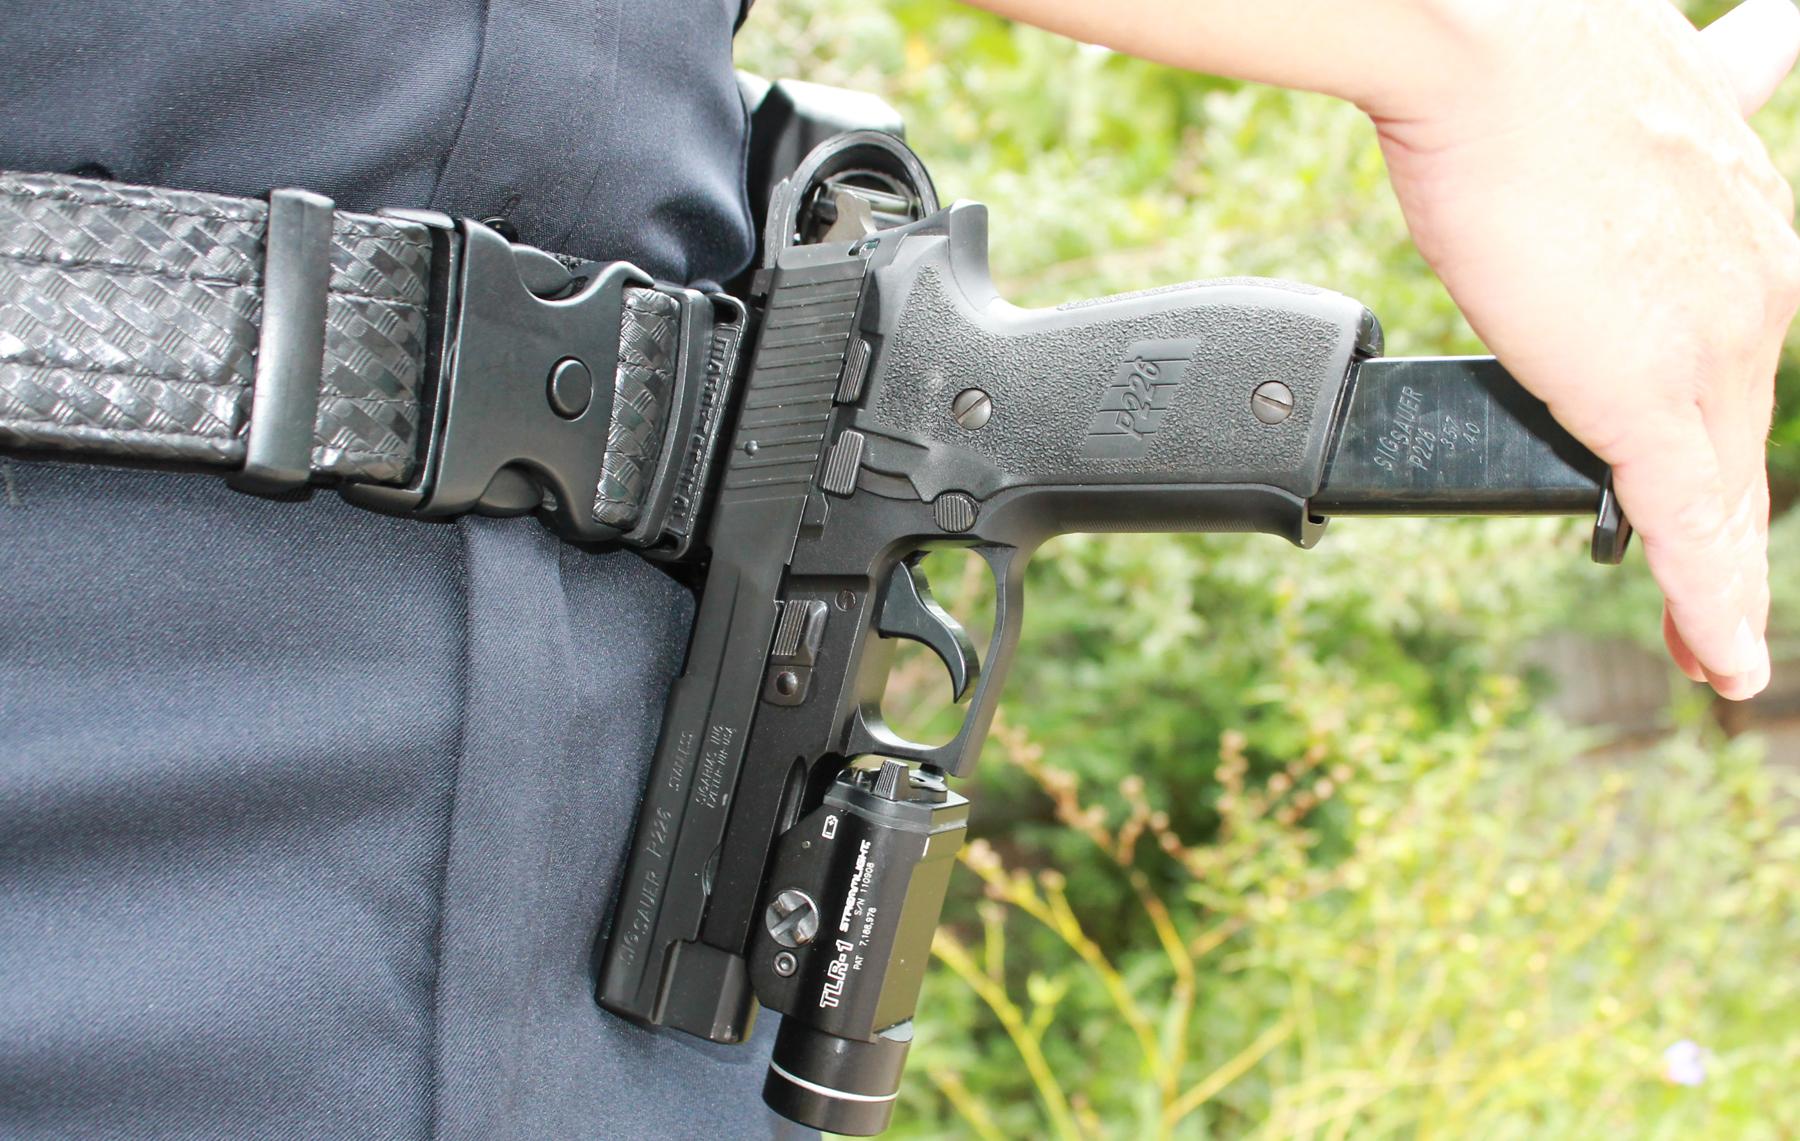 magazine clip holders for guns - HD1800×1141